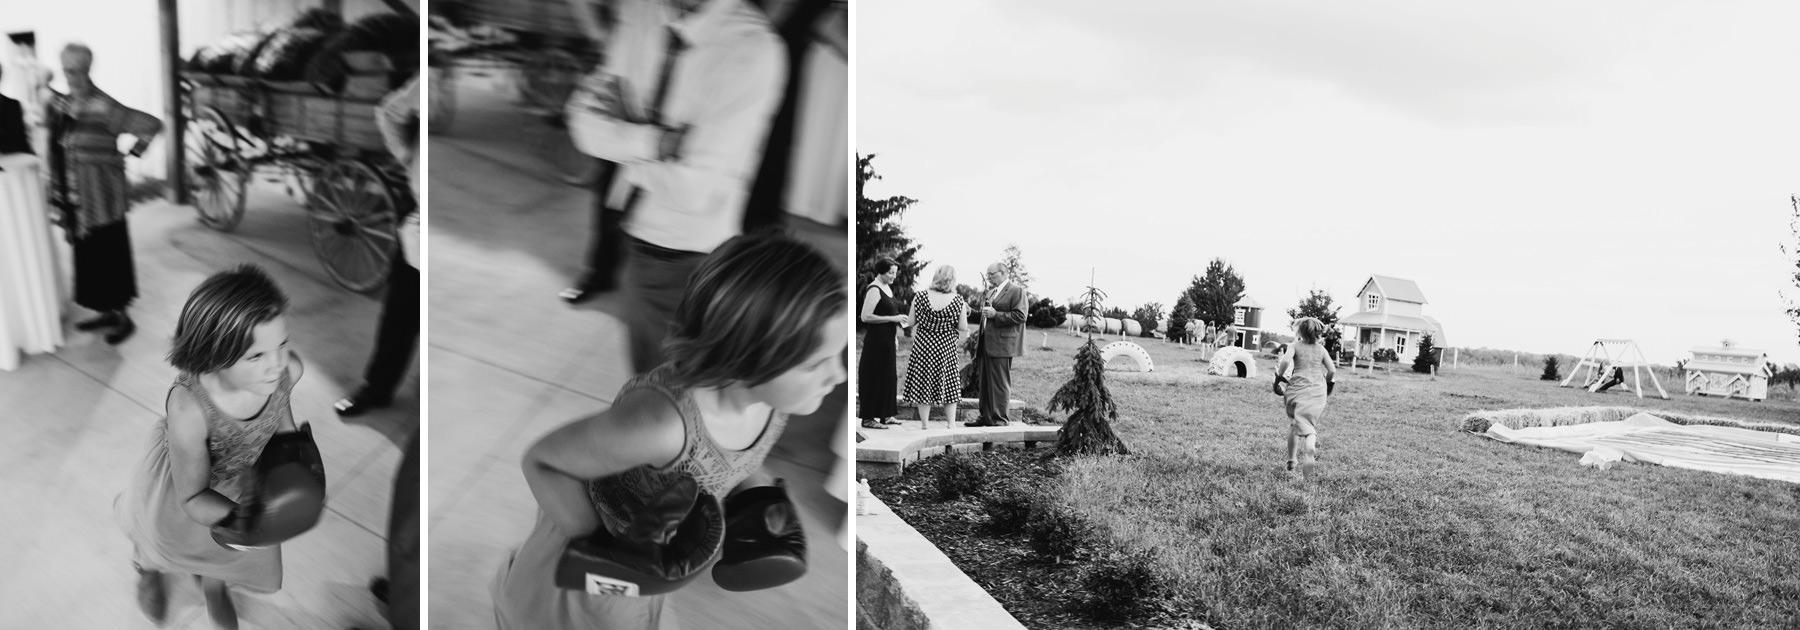 Alldredge Orchard Kansas City_Kindling Wedding Photography BLOG 65.JPG